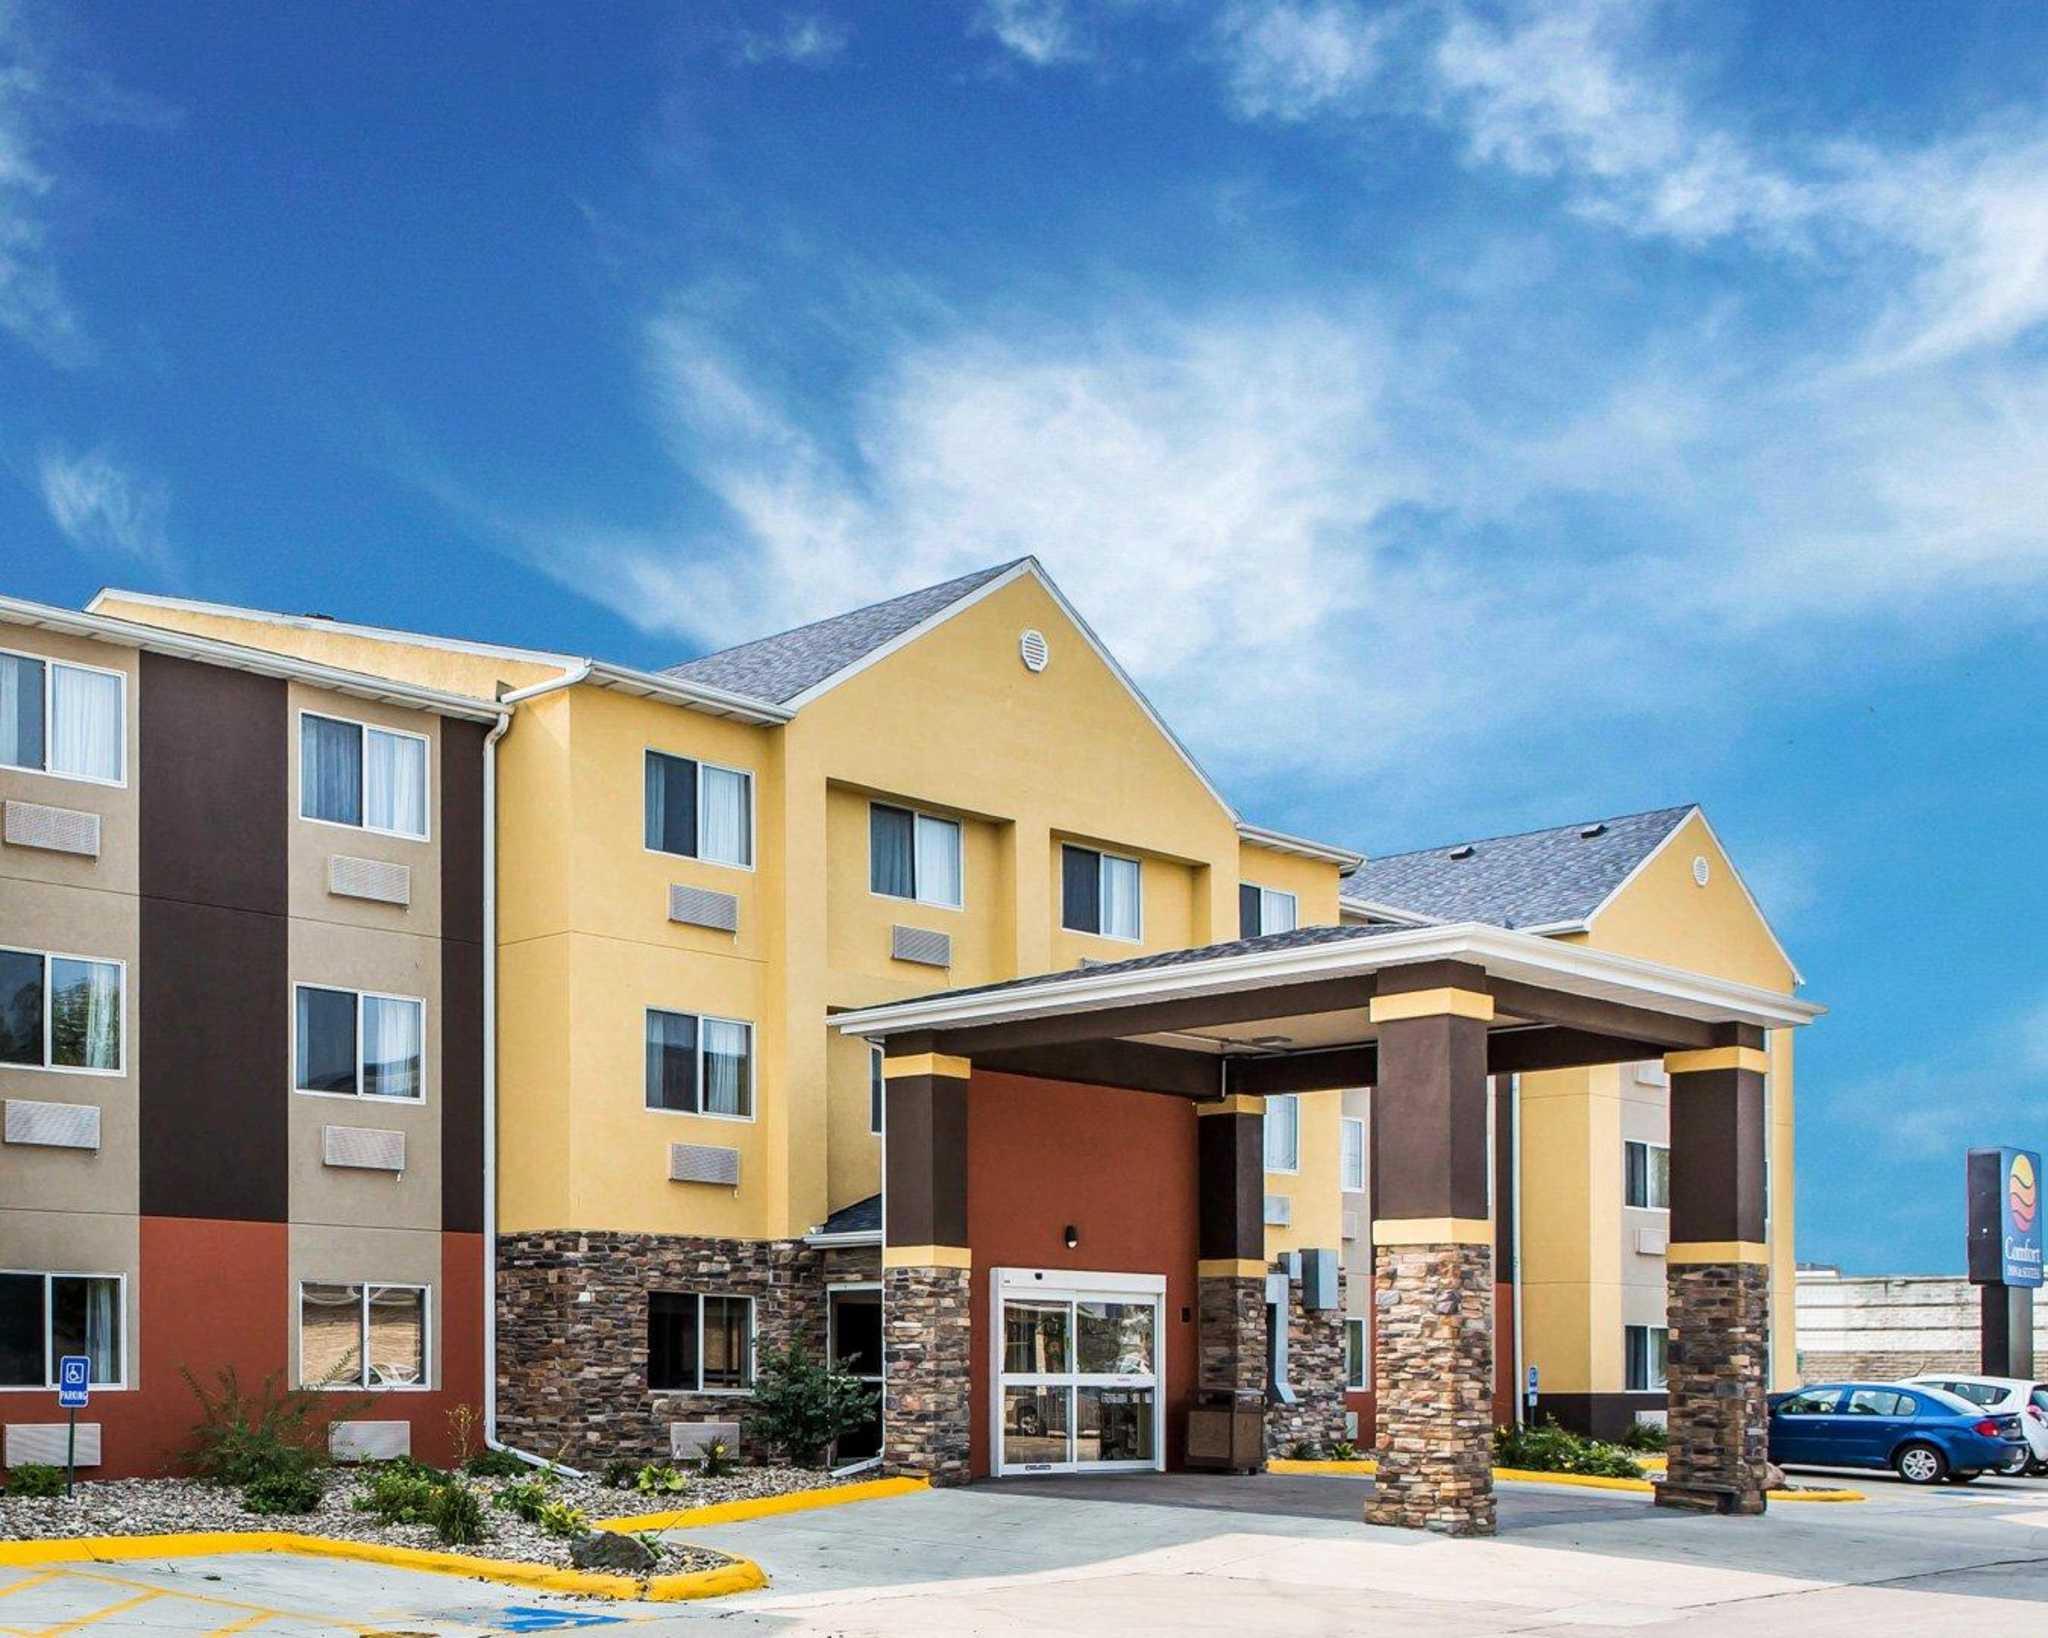 Comfort Inn & Suites Waterloo – Cedar Falls image 1